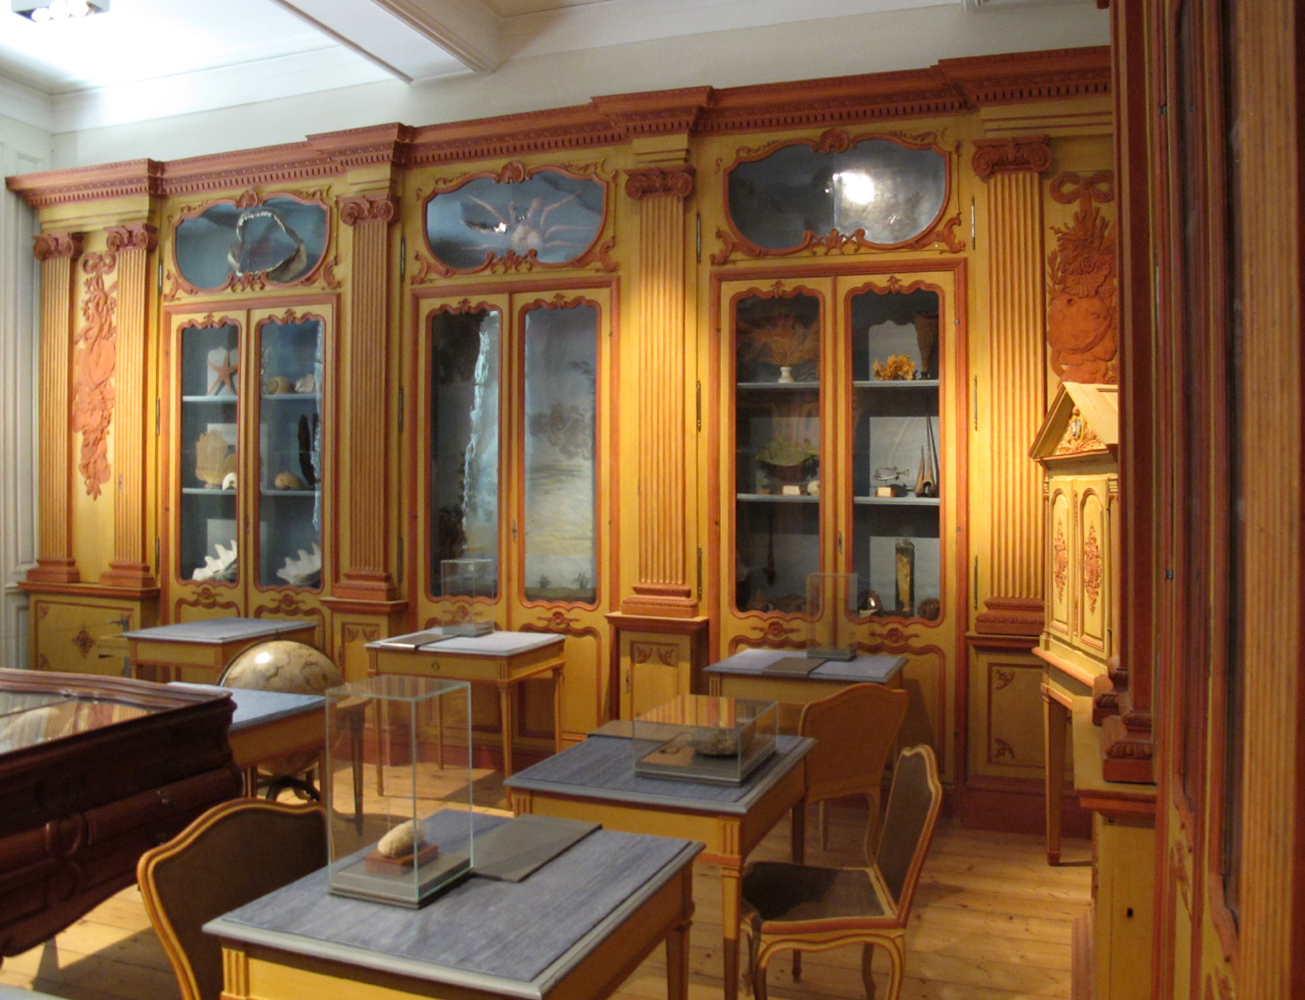 file cabinet lafaille mus 233 um de la rochelle jpg wikimedia commons